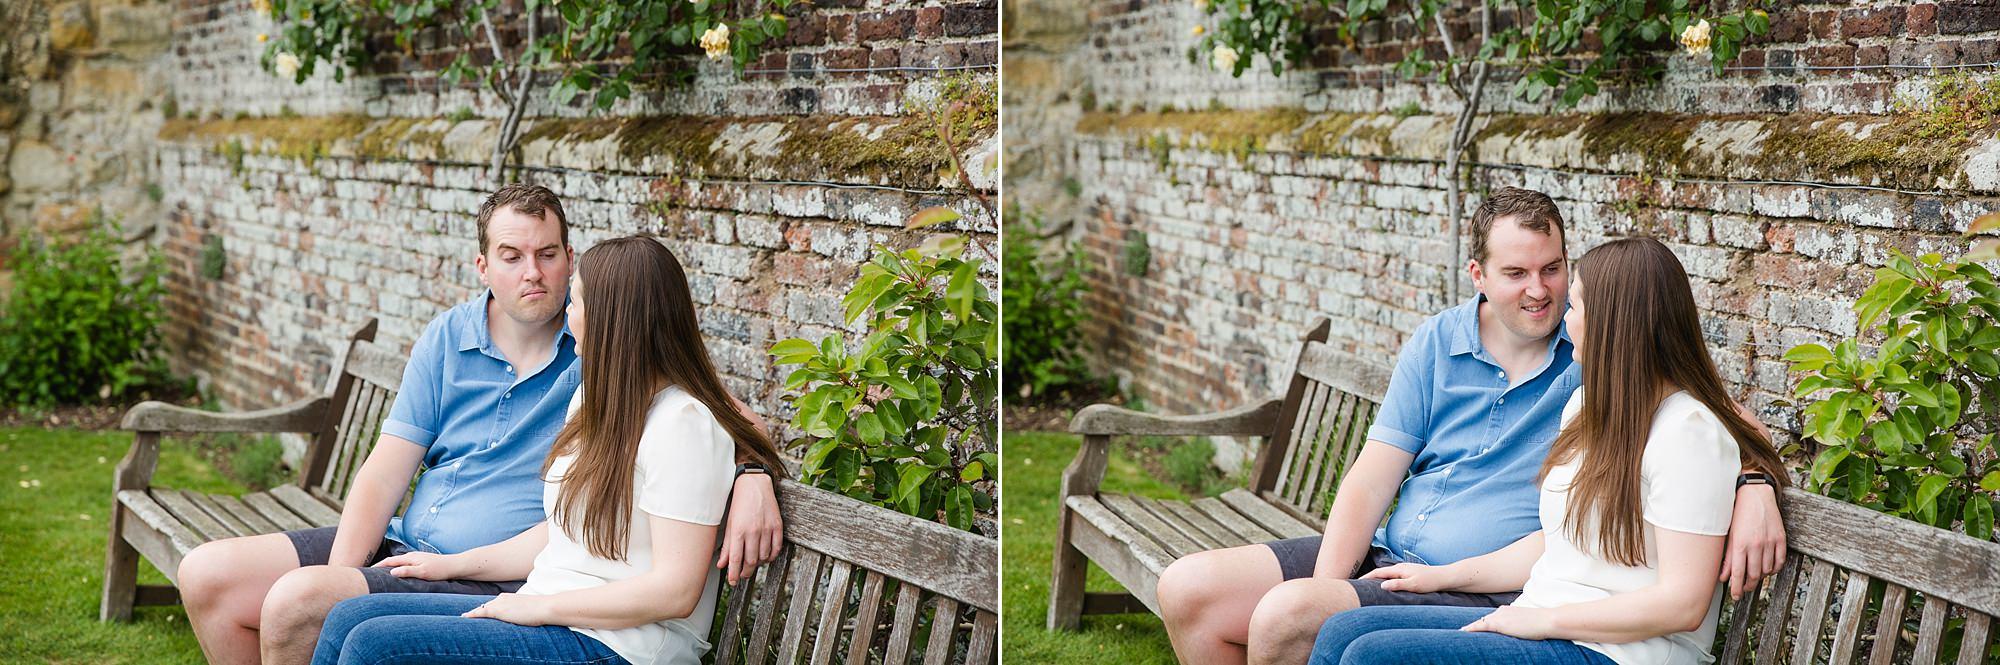 Tonbridge engagement photography portrait of a couple sat together on a bench